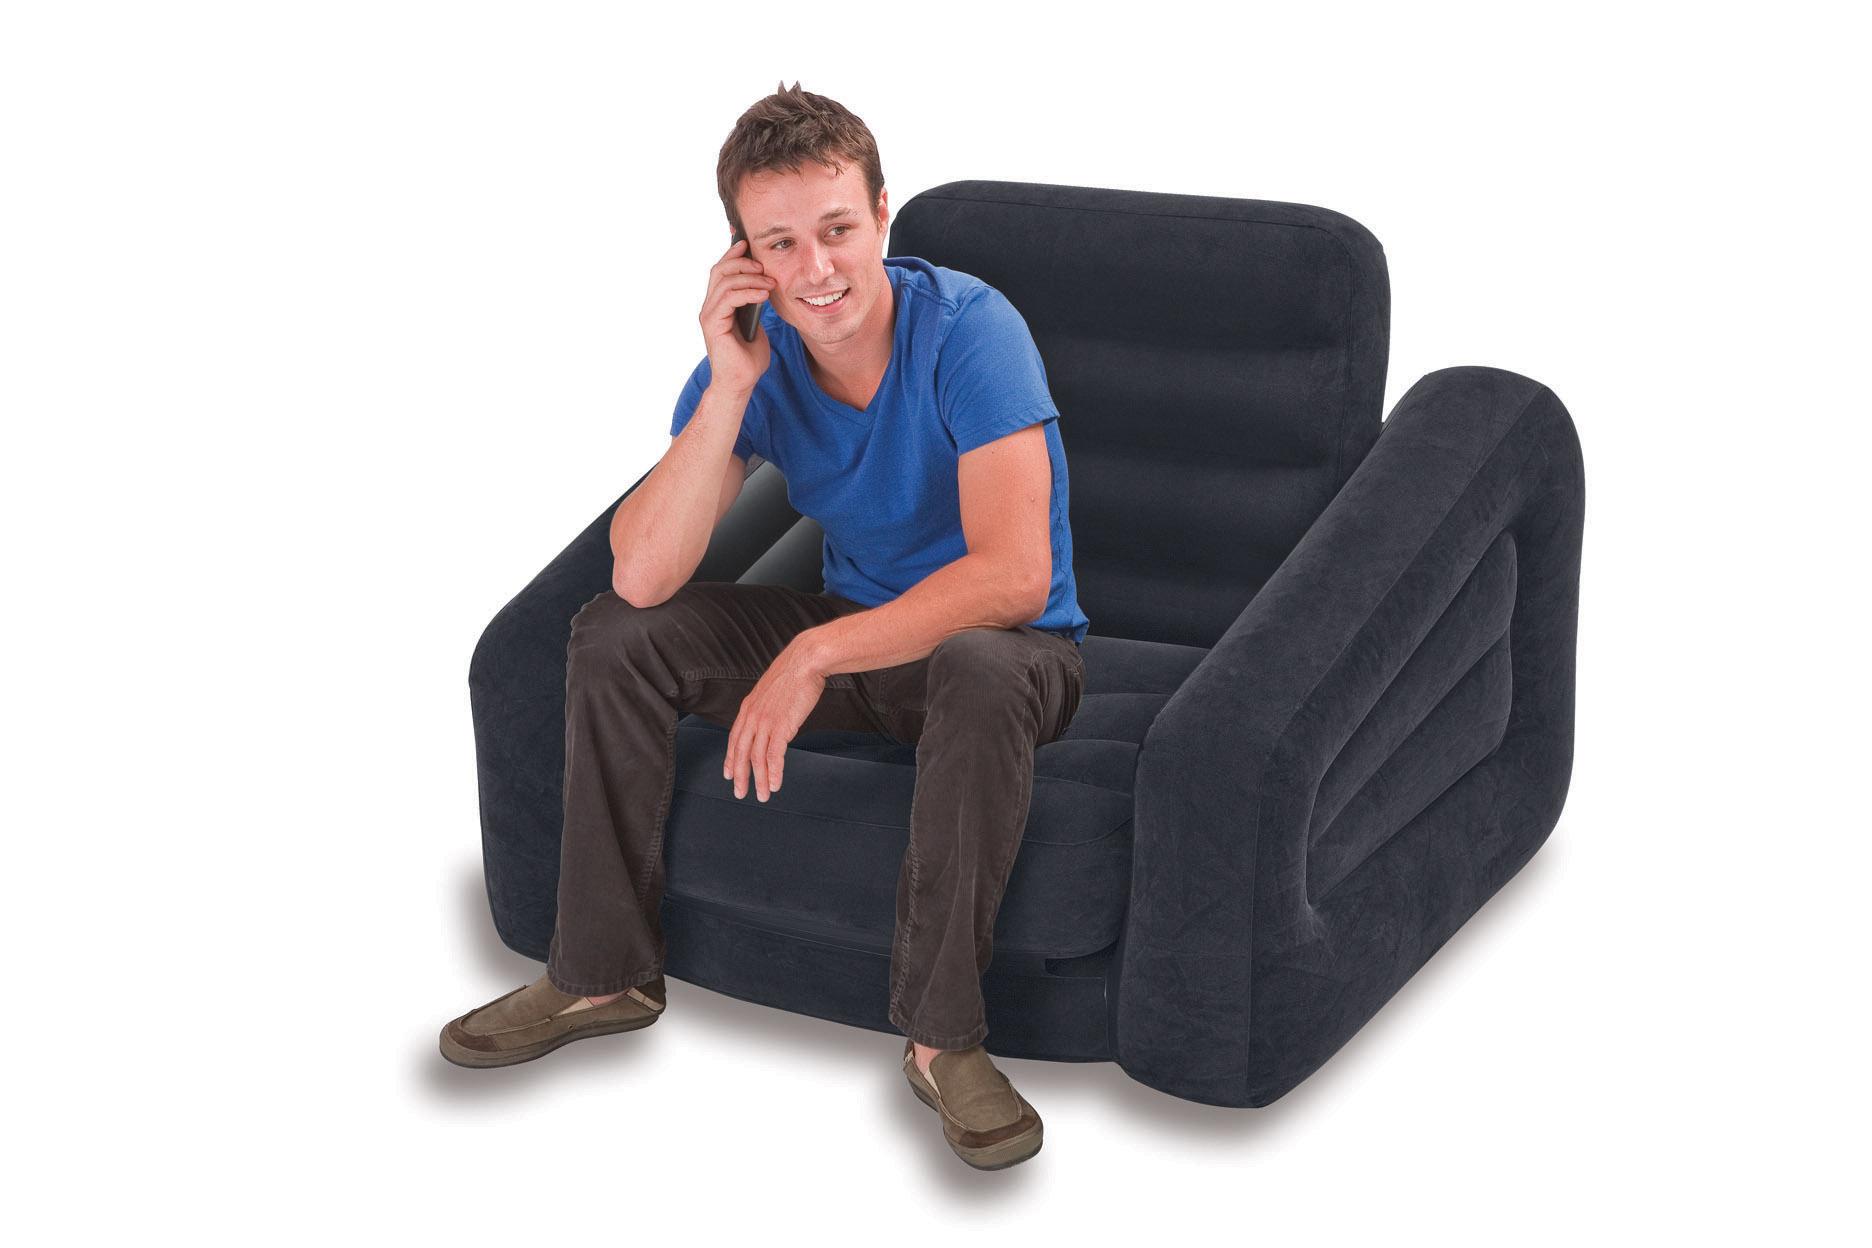 intex lounge couch sessel ausziehbar camping luftbett g stebett fernsehsessel ebay. Black Bedroom Furniture Sets. Home Design Ideas